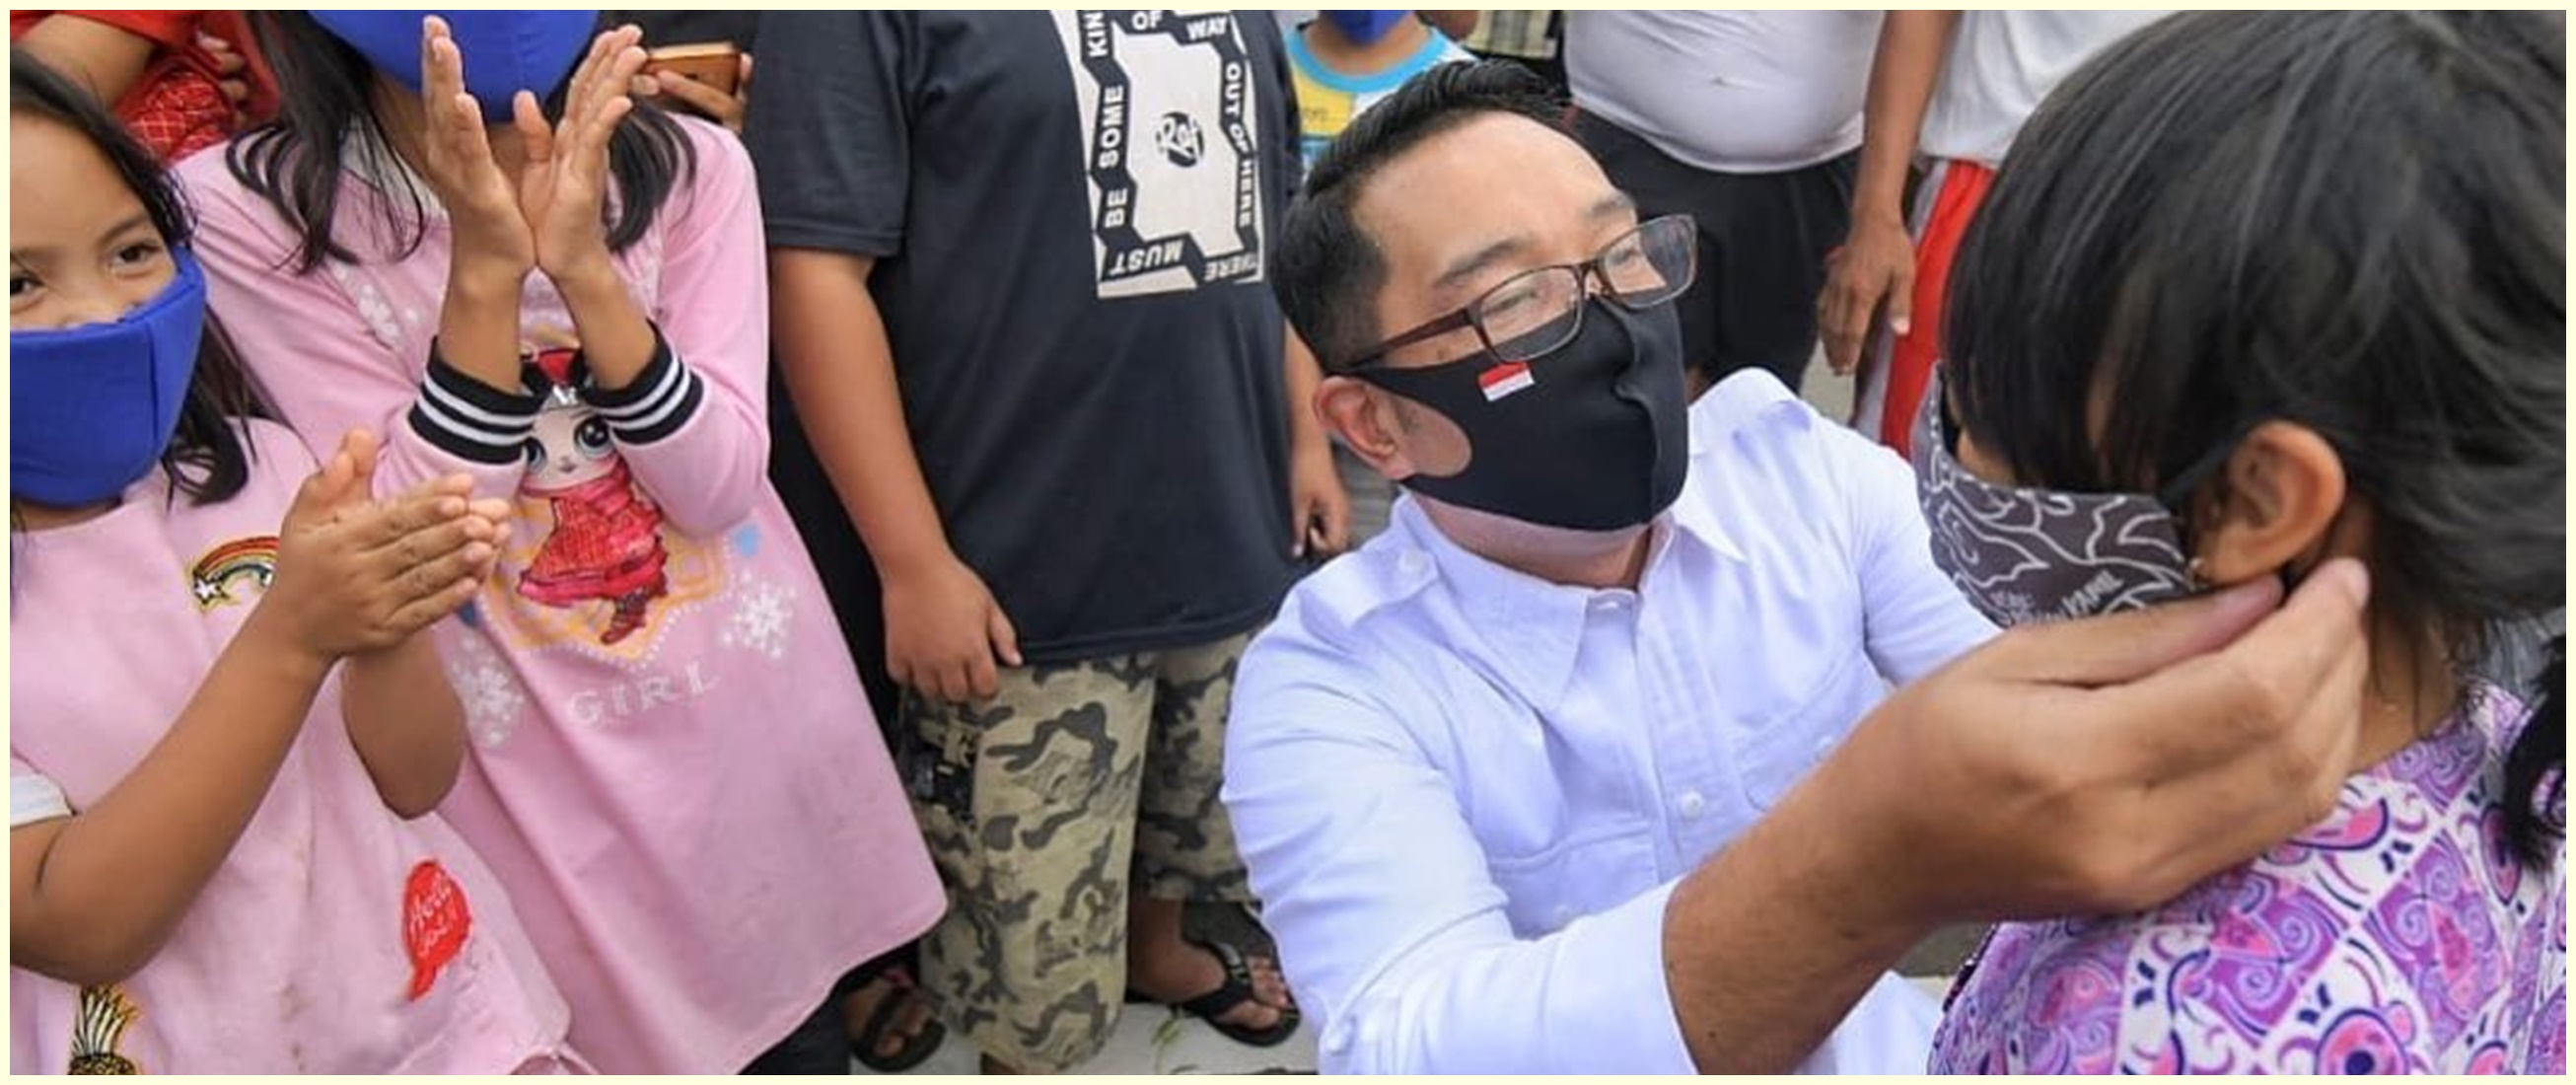 8 Momen Ridwan Kamil keliling kota bagikan masker ke anak-anak